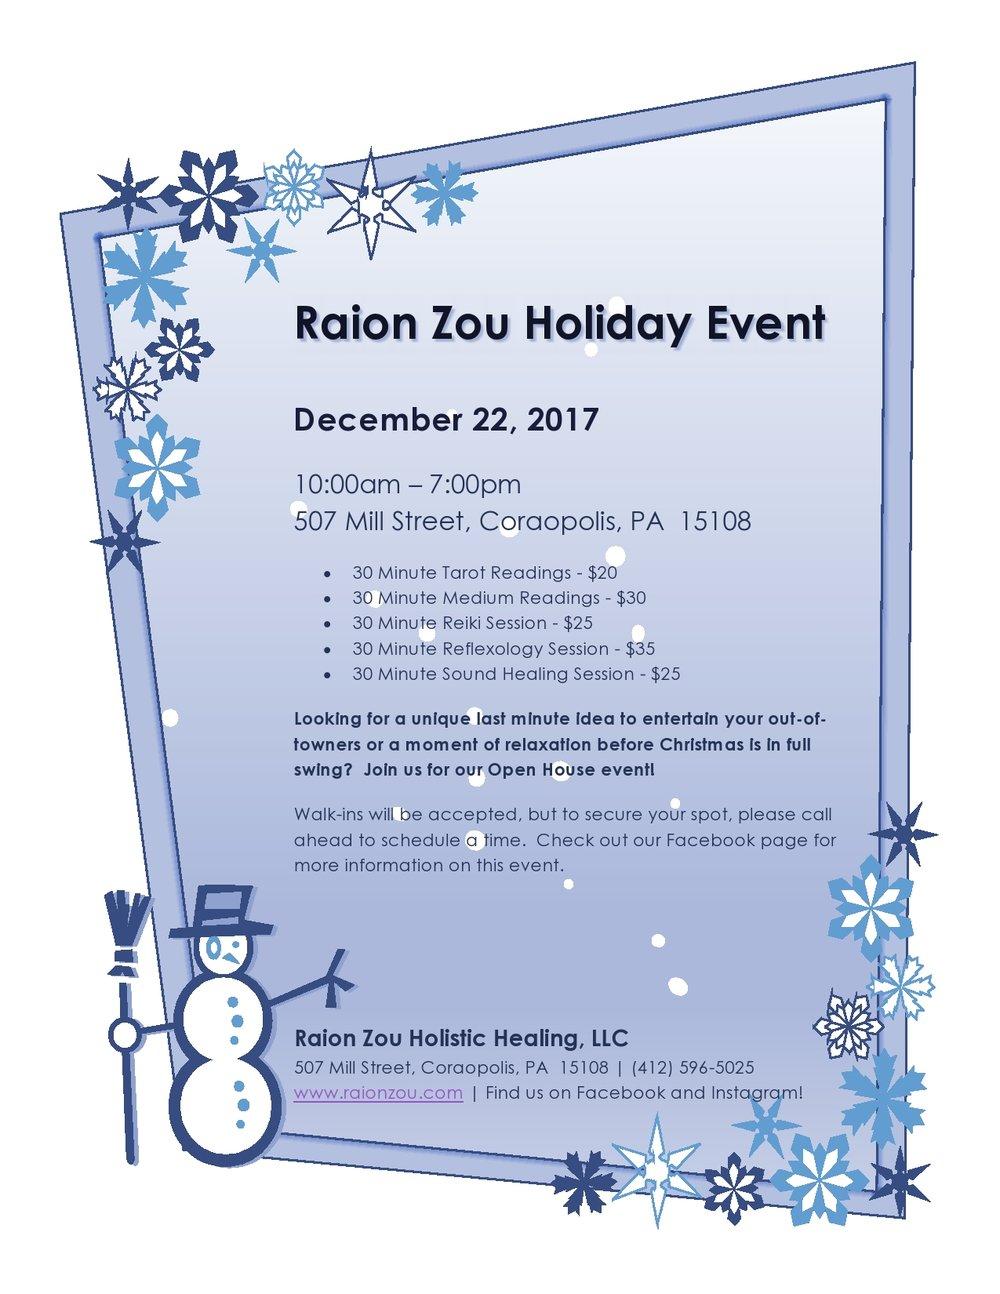 Raion Zou Holiday Event-page0001.jpg